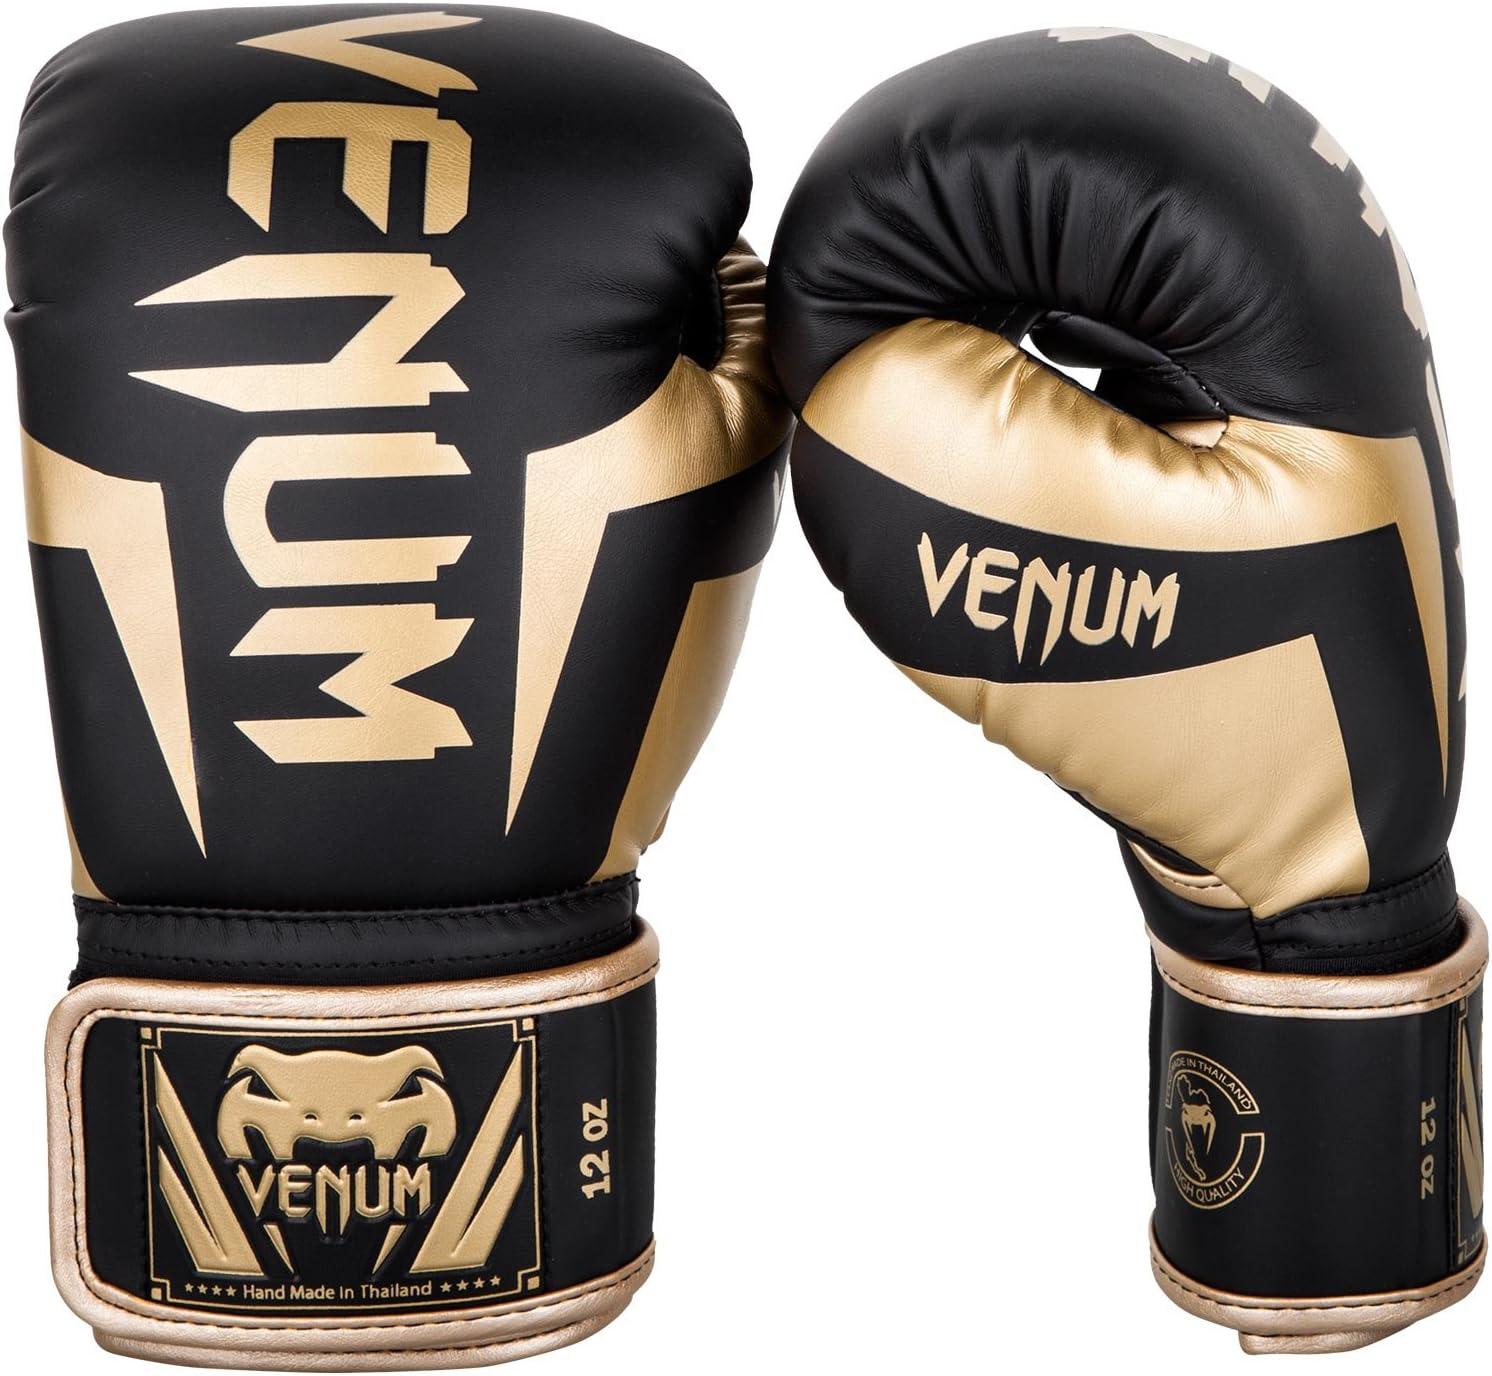 VENUM [ヴェヌム] ボクシンググローブ Elite - エリート(黒/ゴールド)  14oz